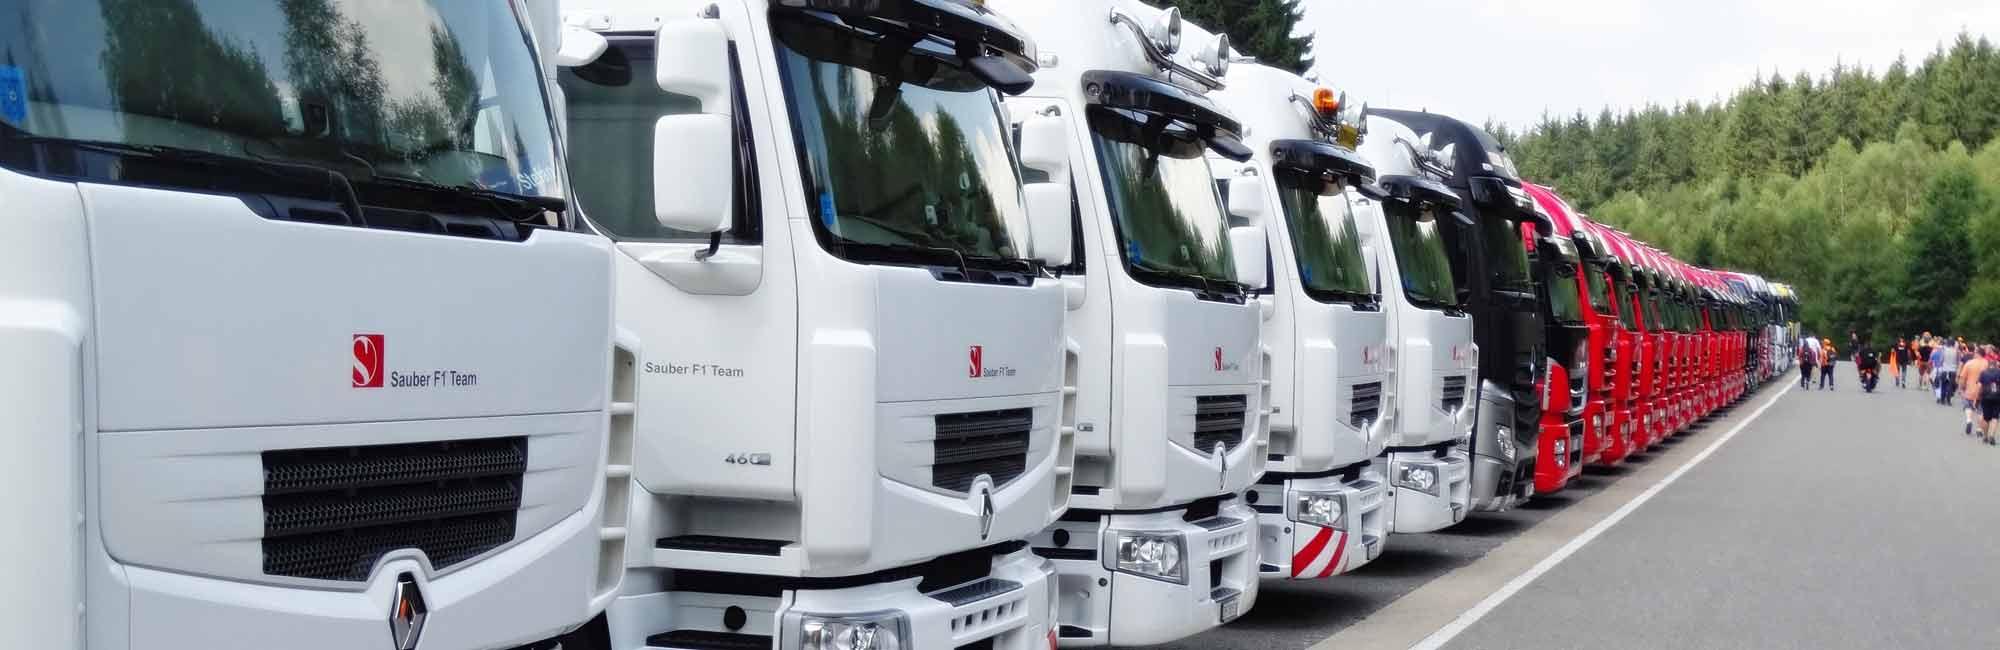 Scania, DAF en Volvo - Truckinterieur De Regt